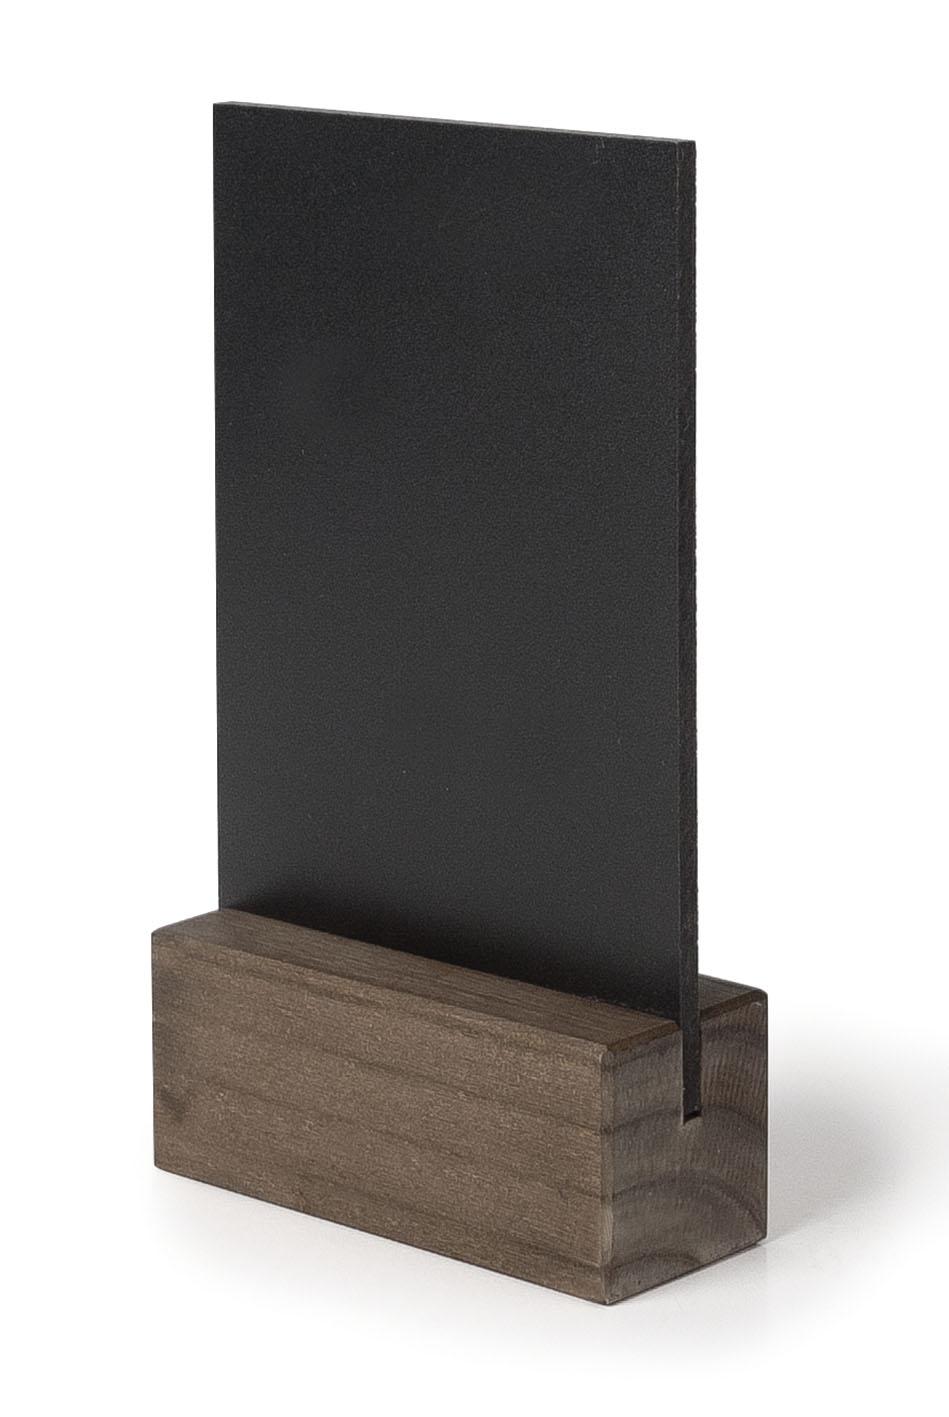 Informační tabulka 15x20 cm